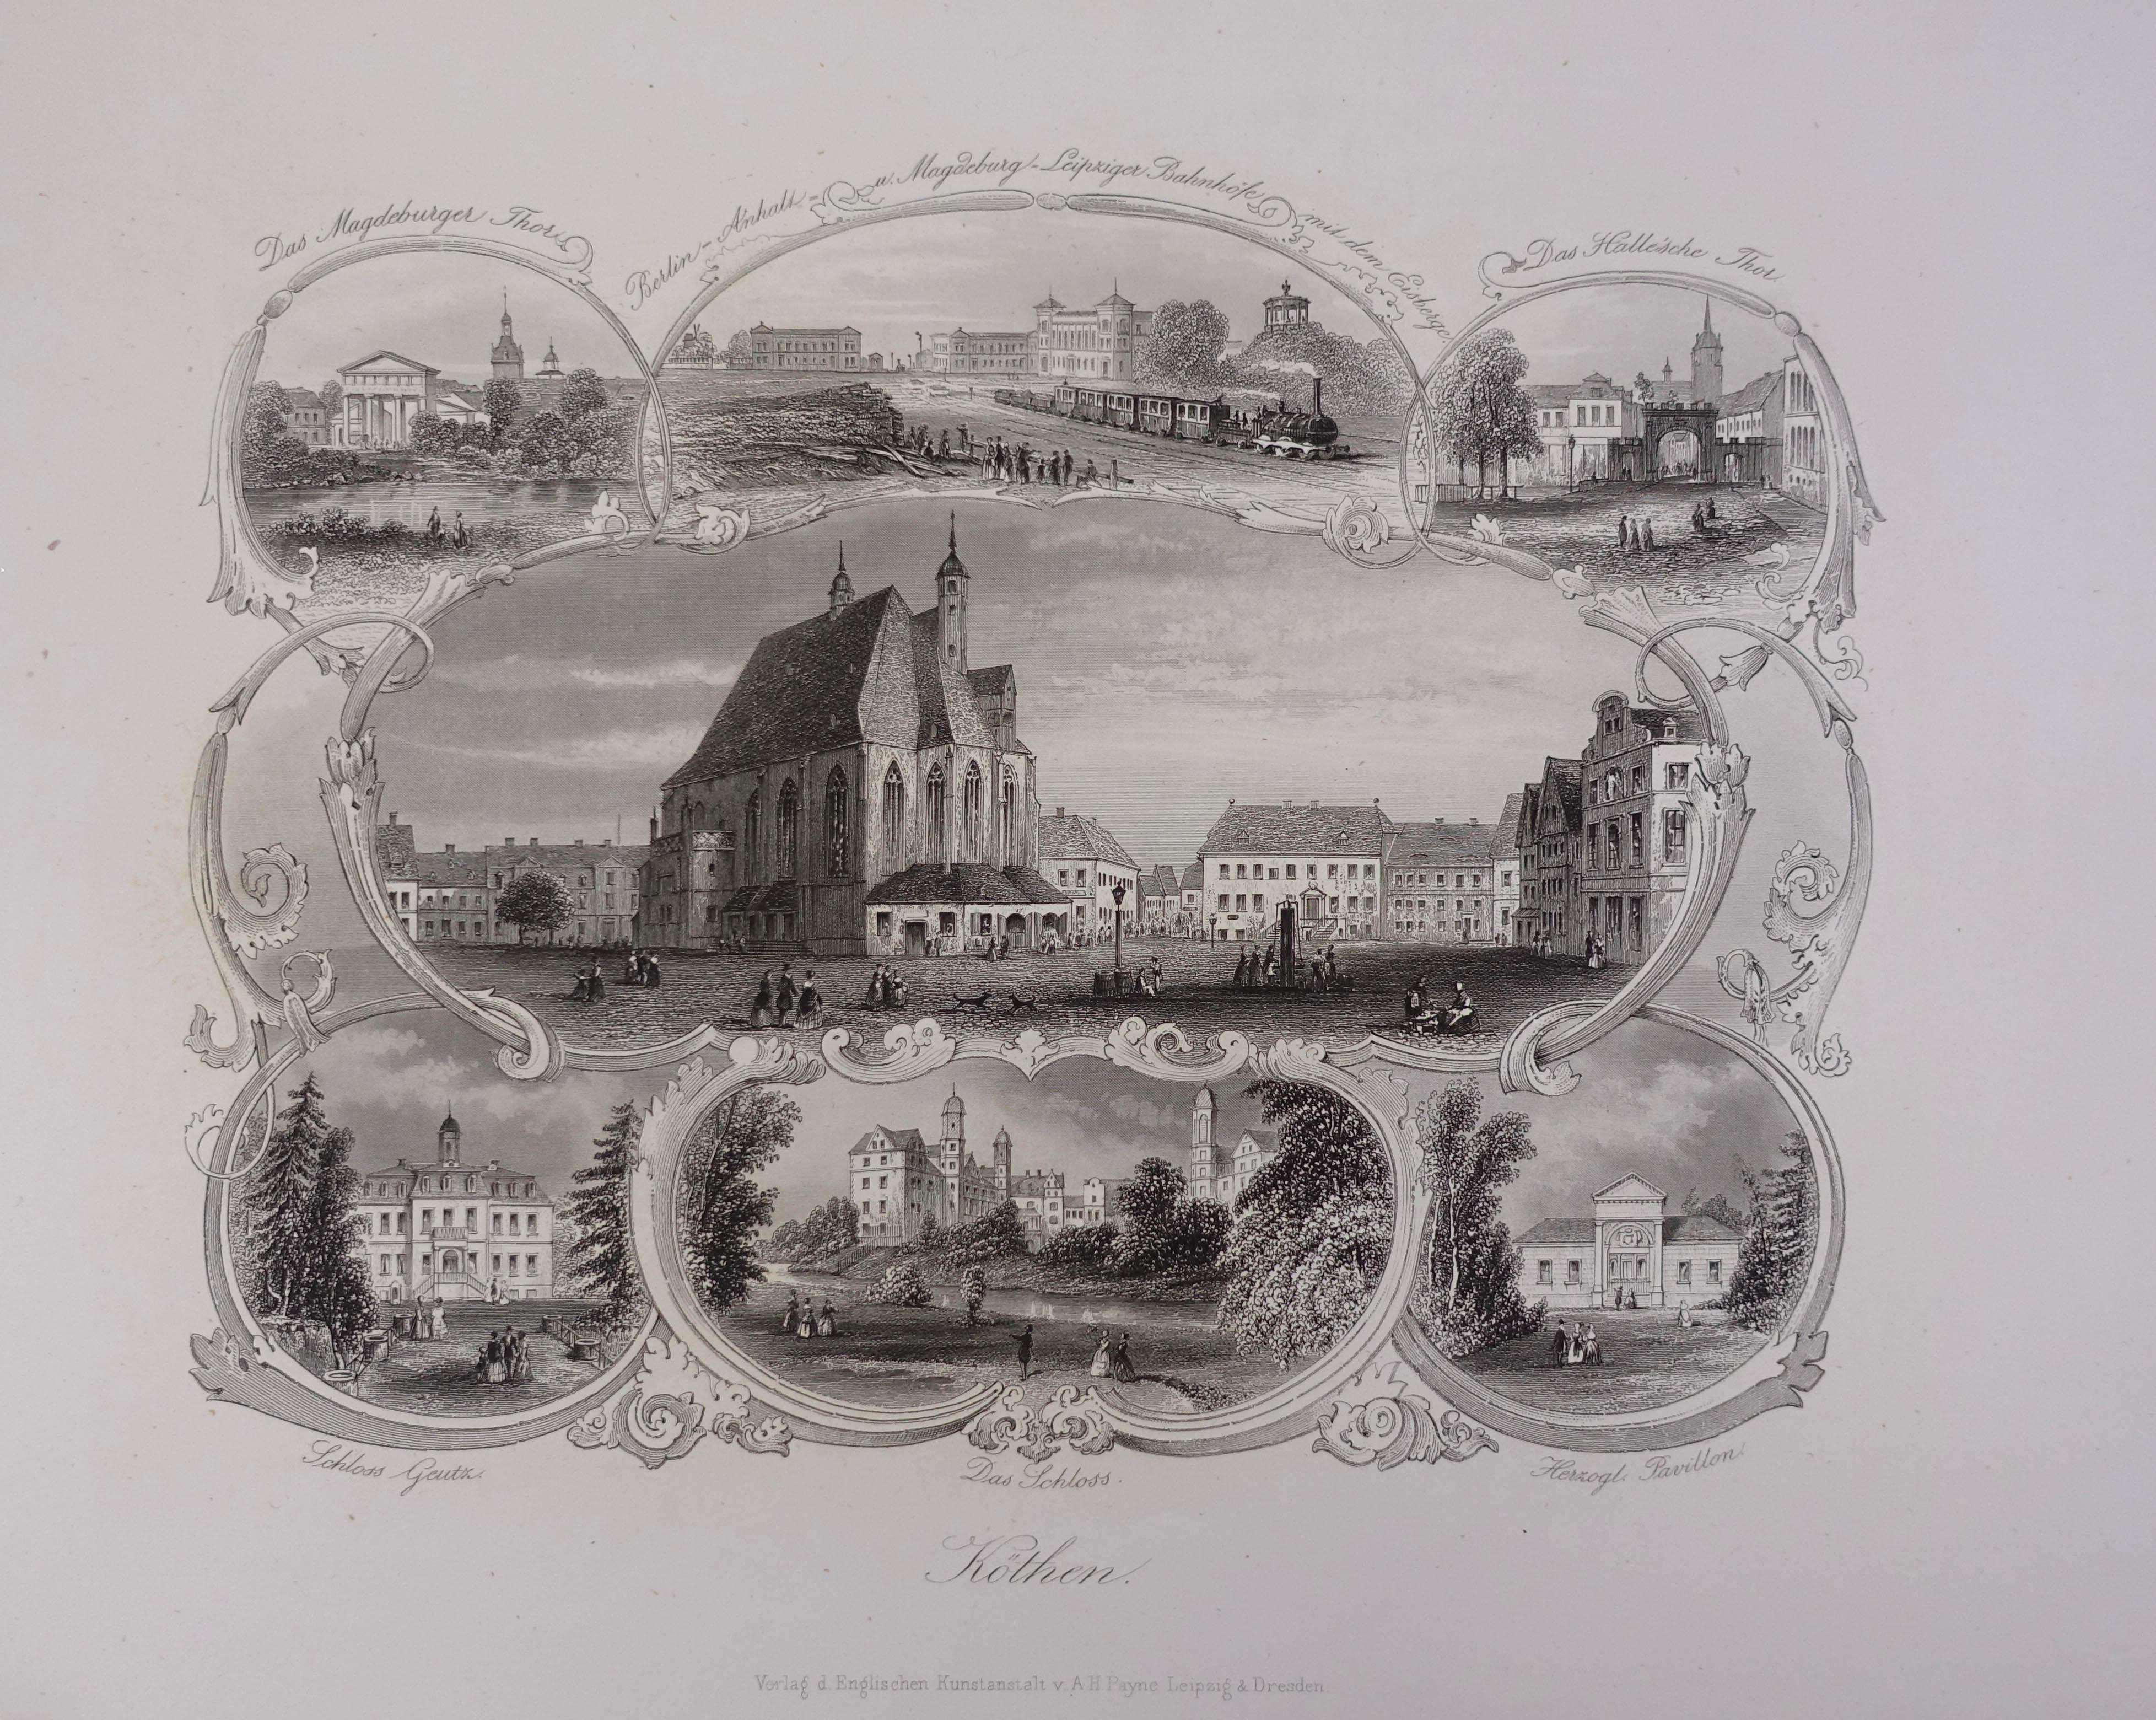 Köthen. Souvenirblatt. 7 Darstellungen auf 1 Blatt.: Köthen